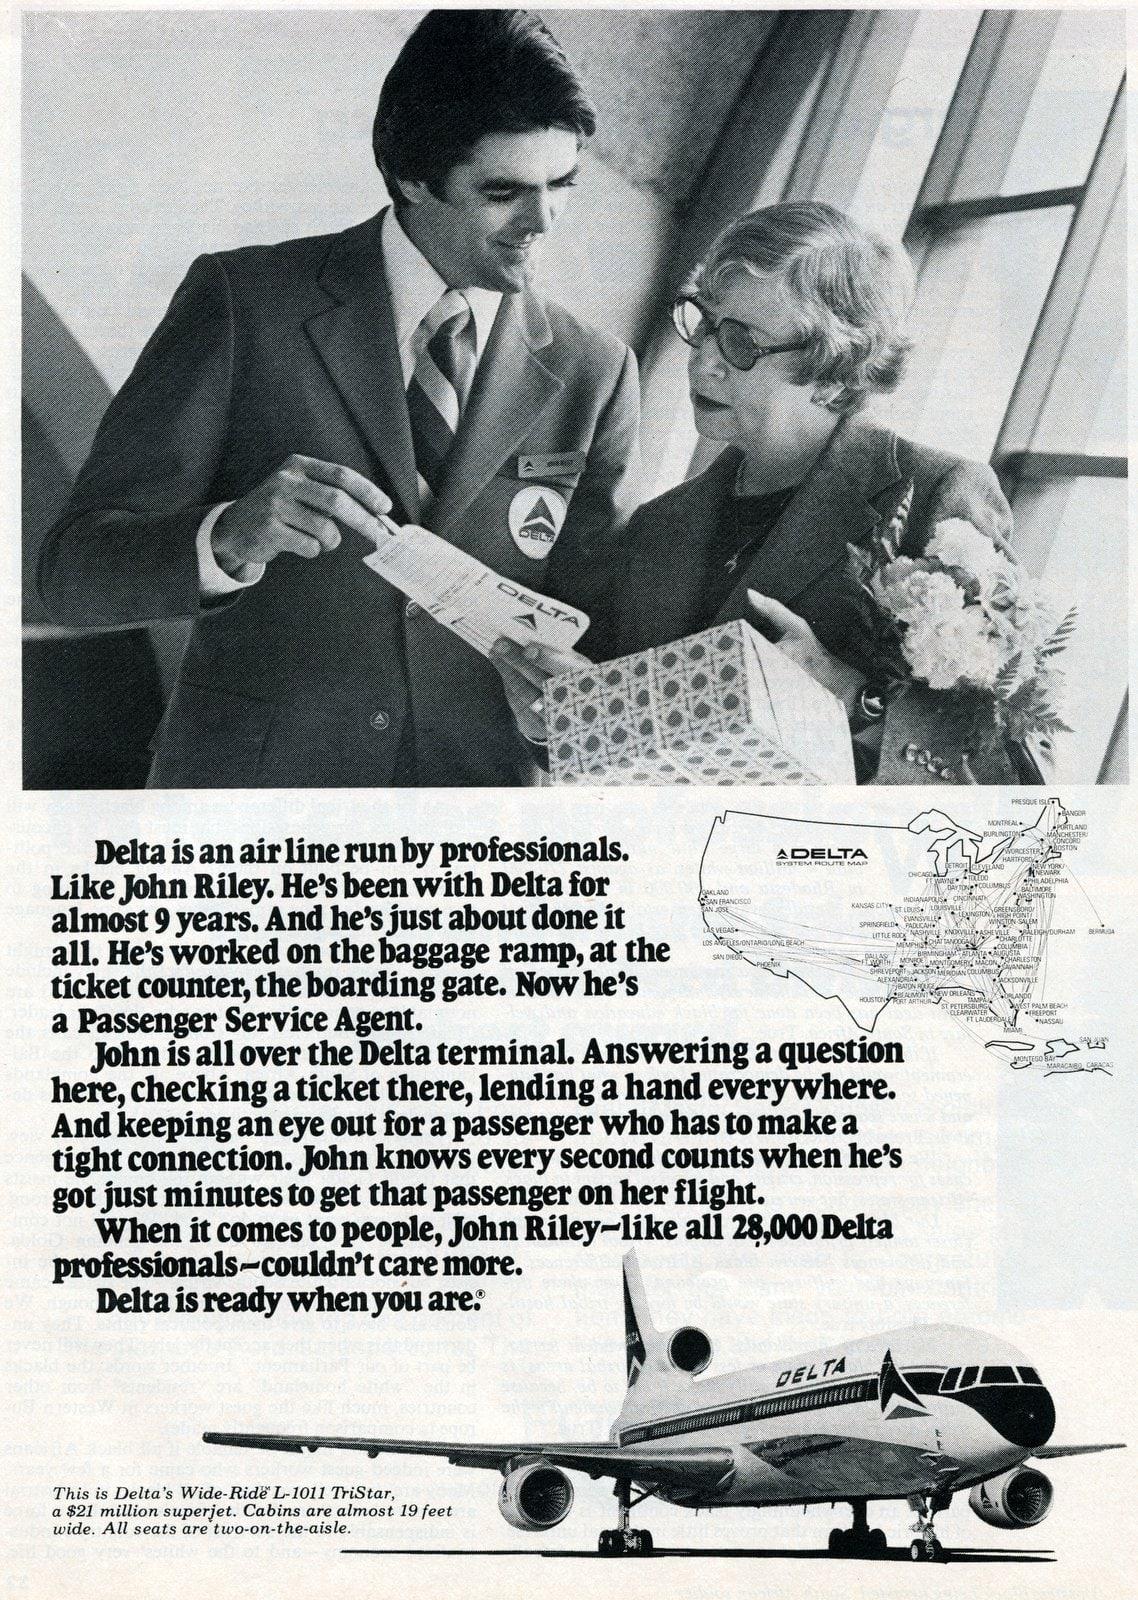 Delta Airlines Passenger service agent John Riley